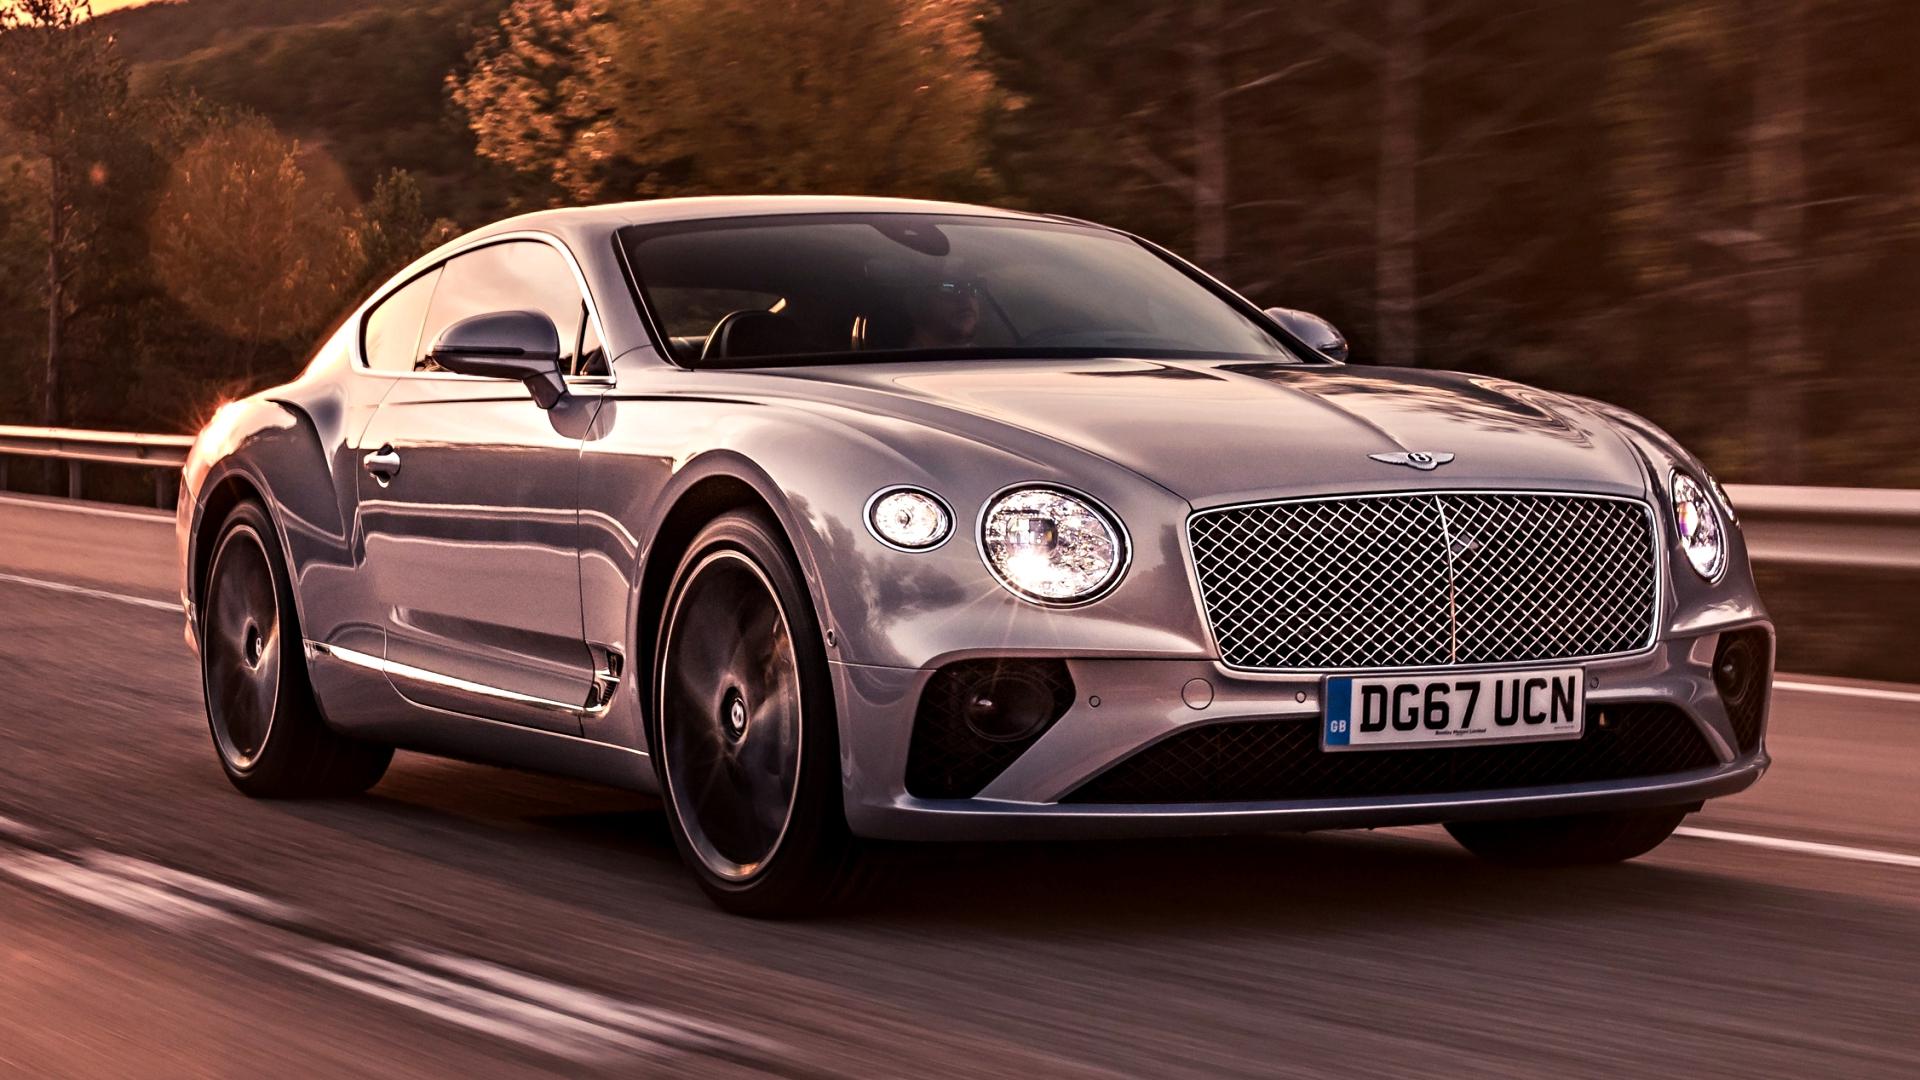 News - '19 Bentley Continental GT W12 To Make Australia Rumble